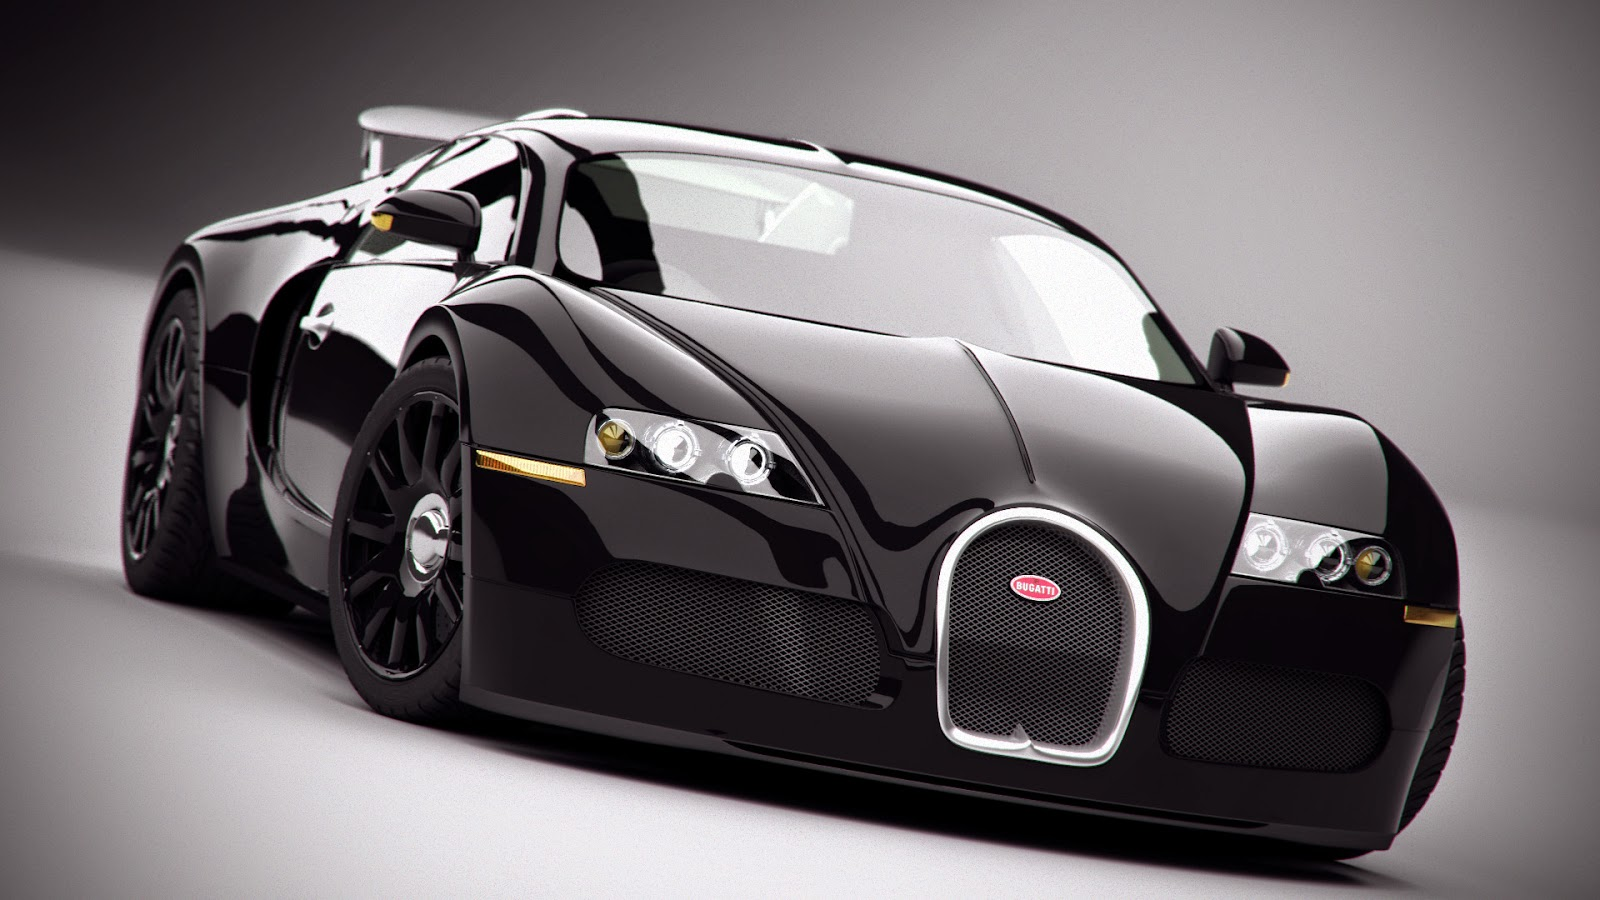 Bugatti ,bugatti veyron,bugatti veyron price,bugatti for sale,bugatti veyron super sport,bugatti company,bugatti veyron for sale,bugatti lyrics,bugatti beez,bugatti car,bugatti veyron 0-60